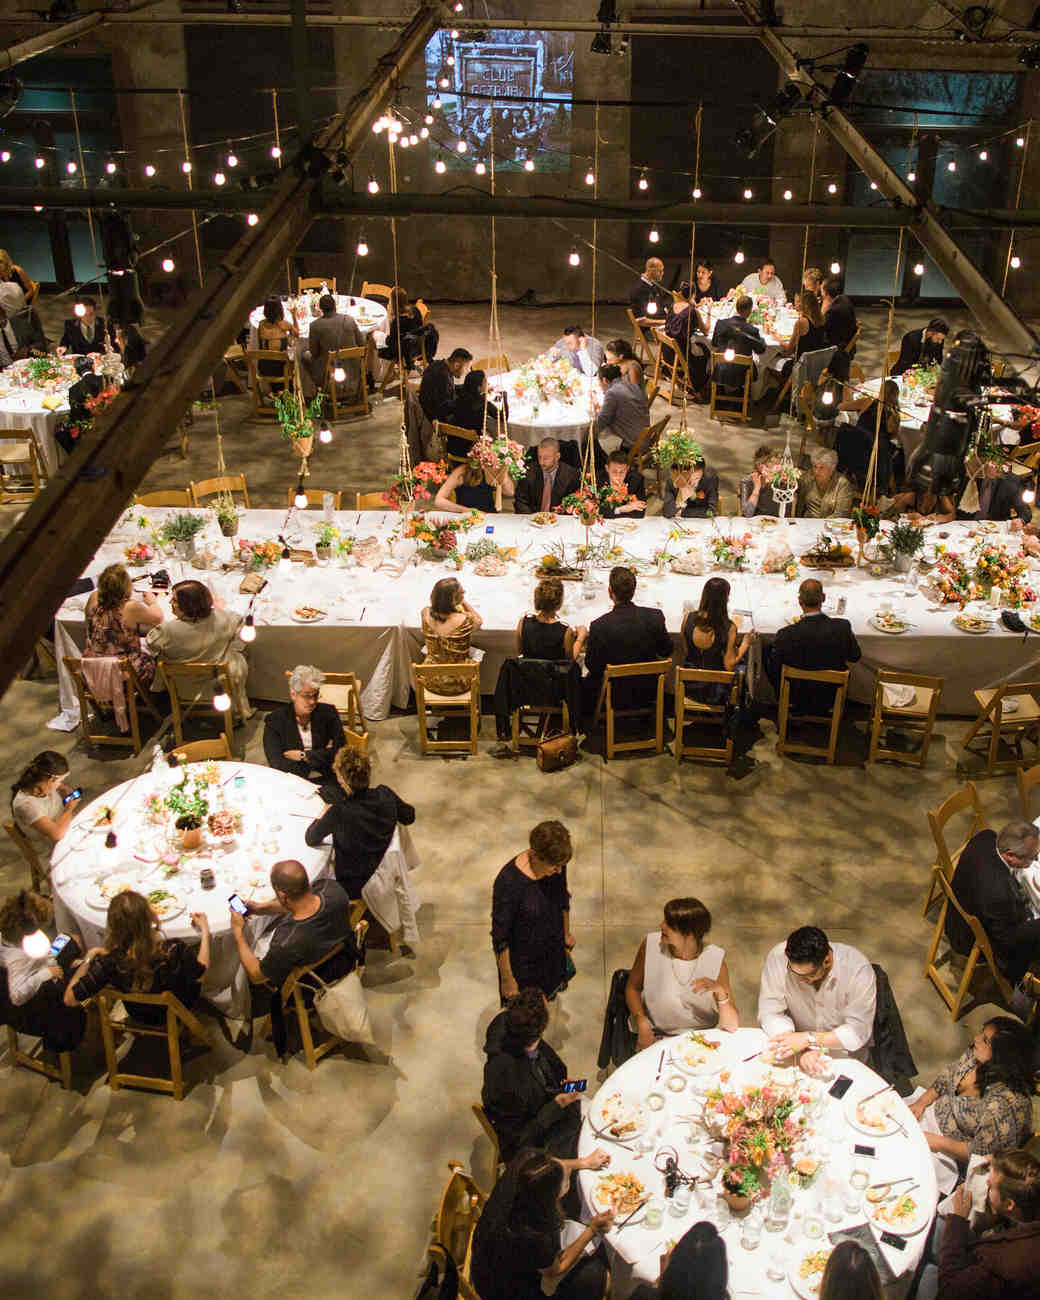 lara-chad-wedding-reception-634-s112306-1115.jpg